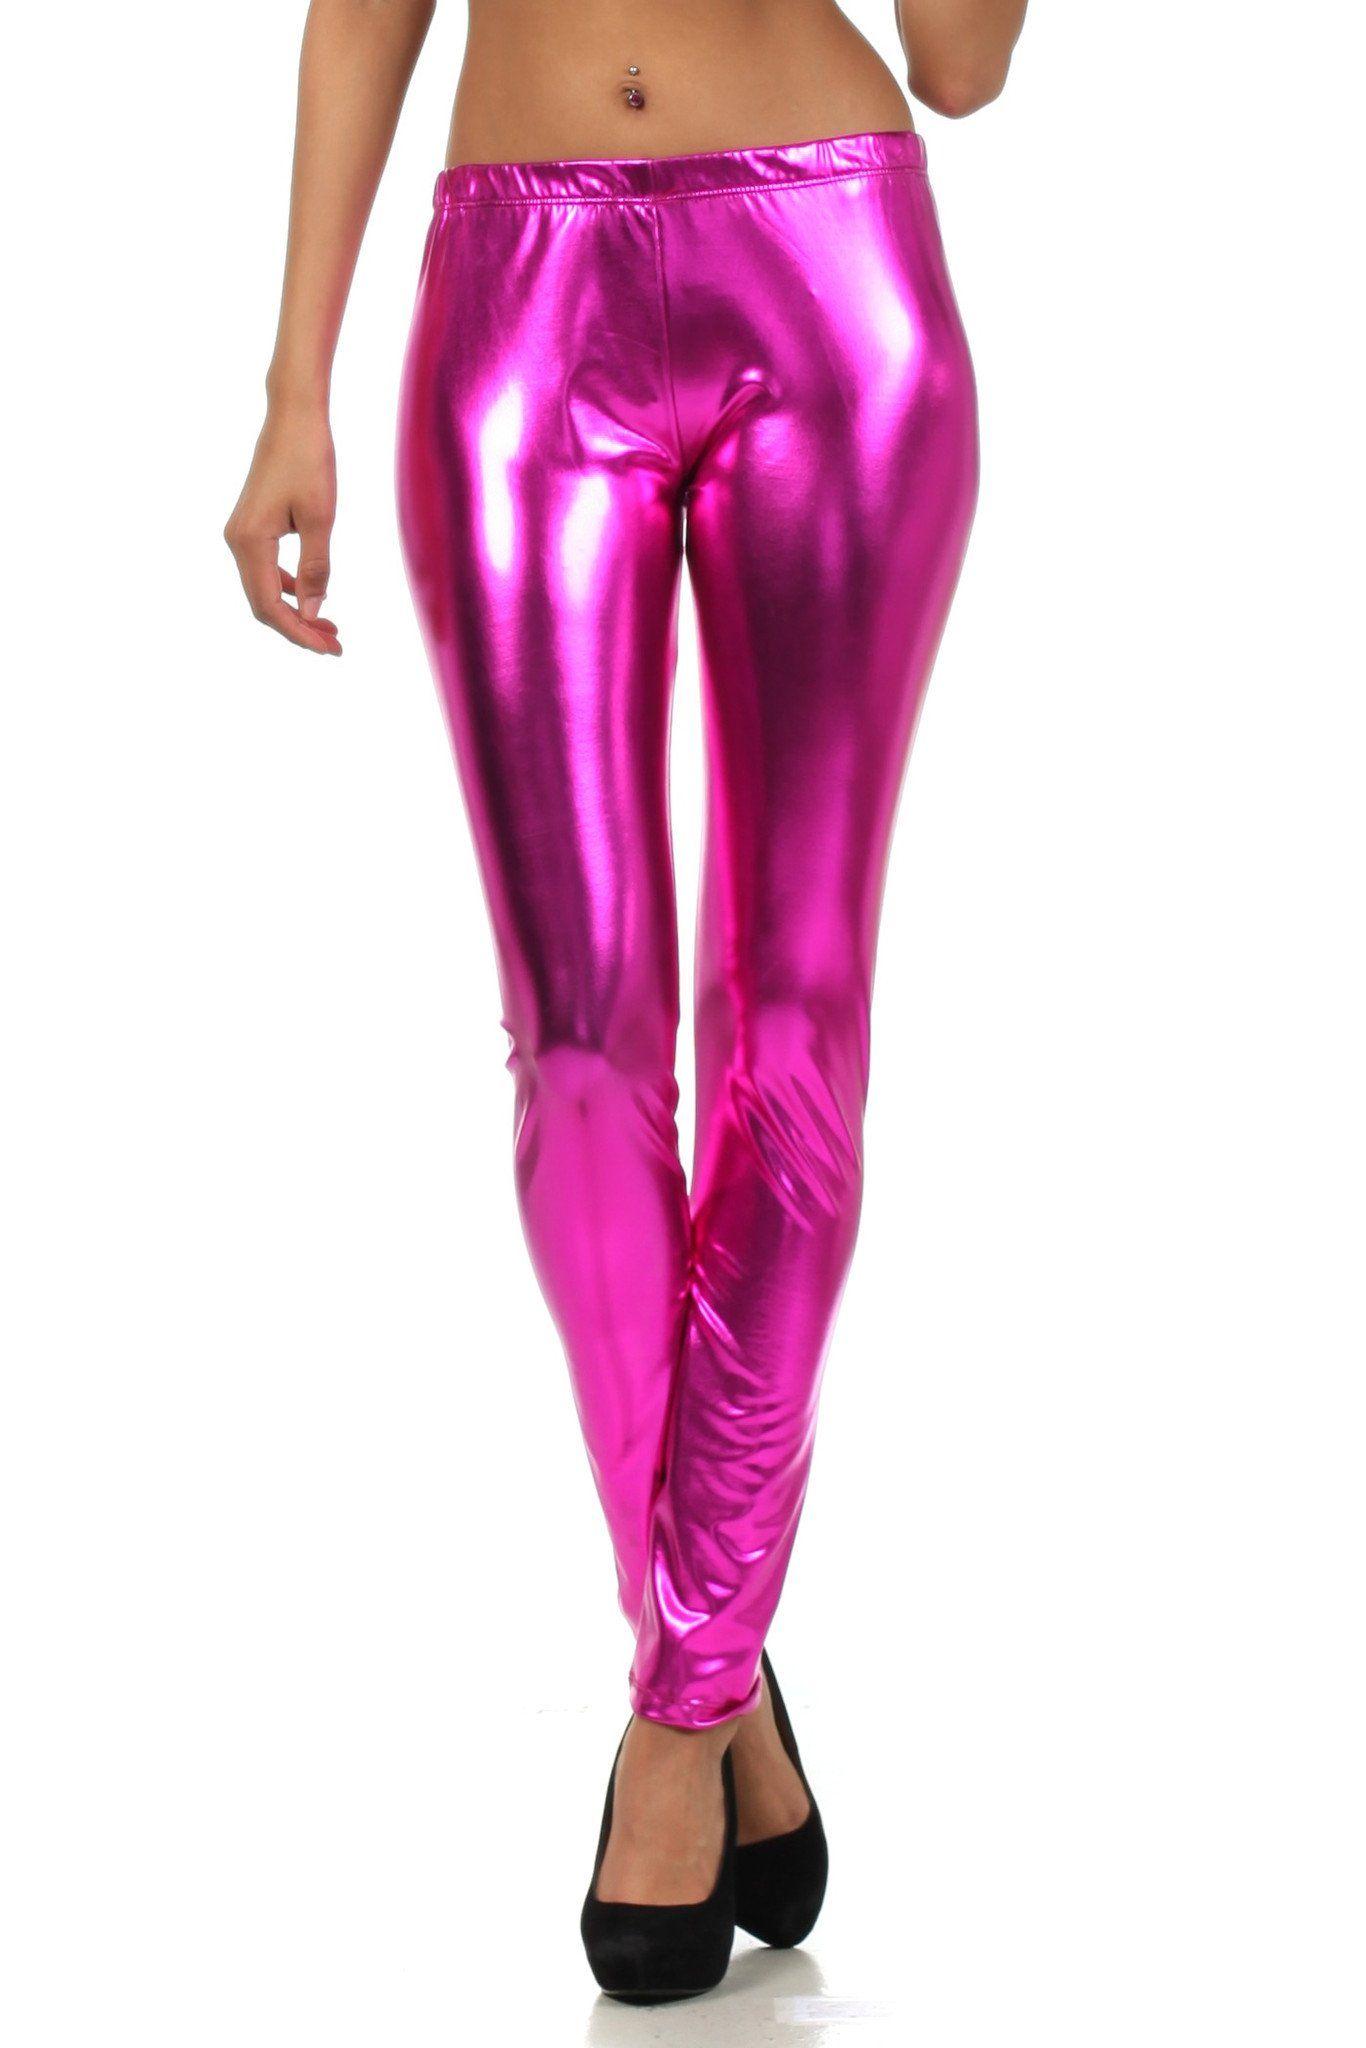 447252dff7723 Sakkas Footless Liquid Wet Look Shiny Metallic Stretch Leggings ...